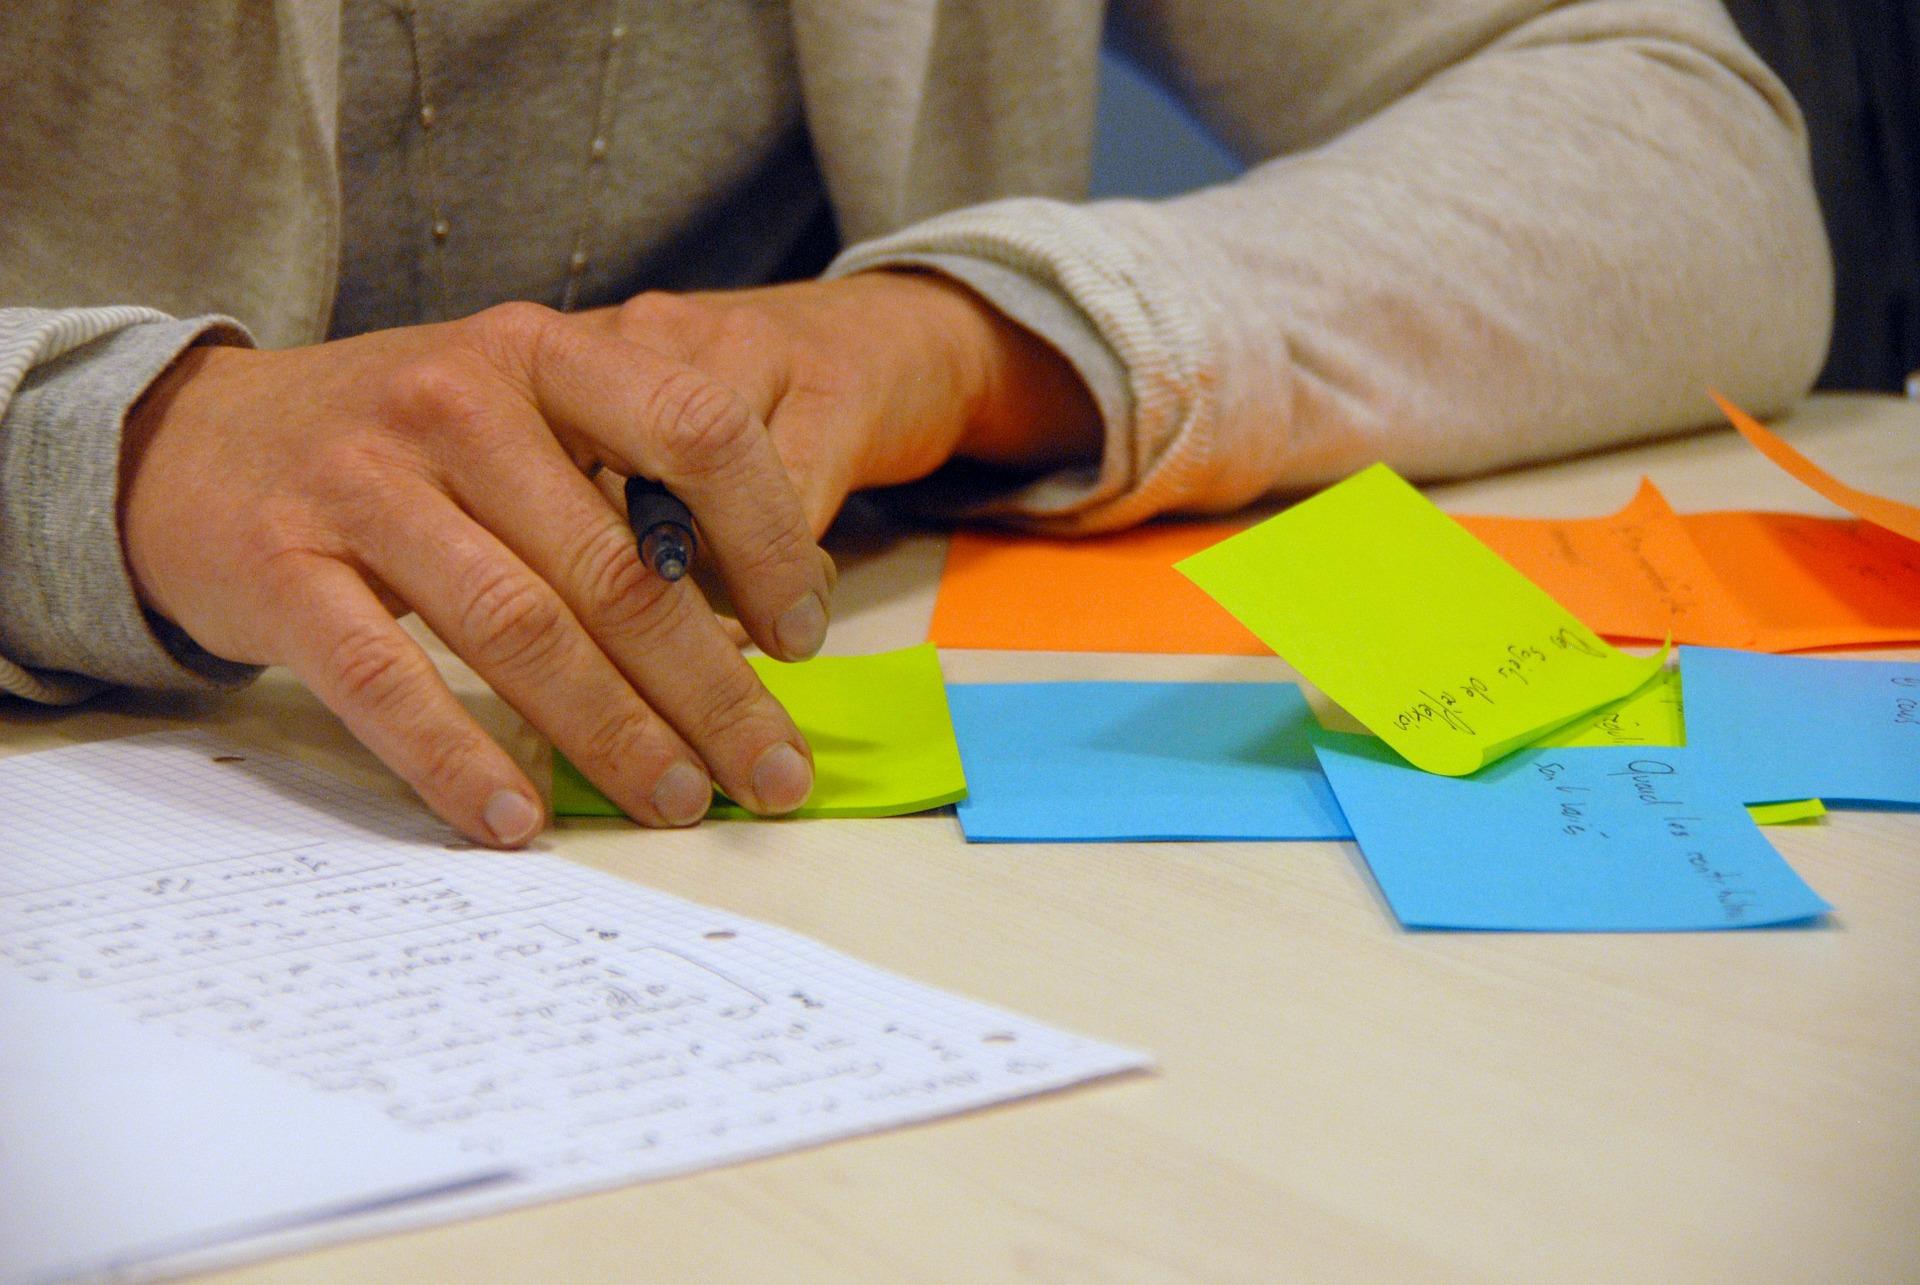 Refletir, brainstorming, líder, profissional